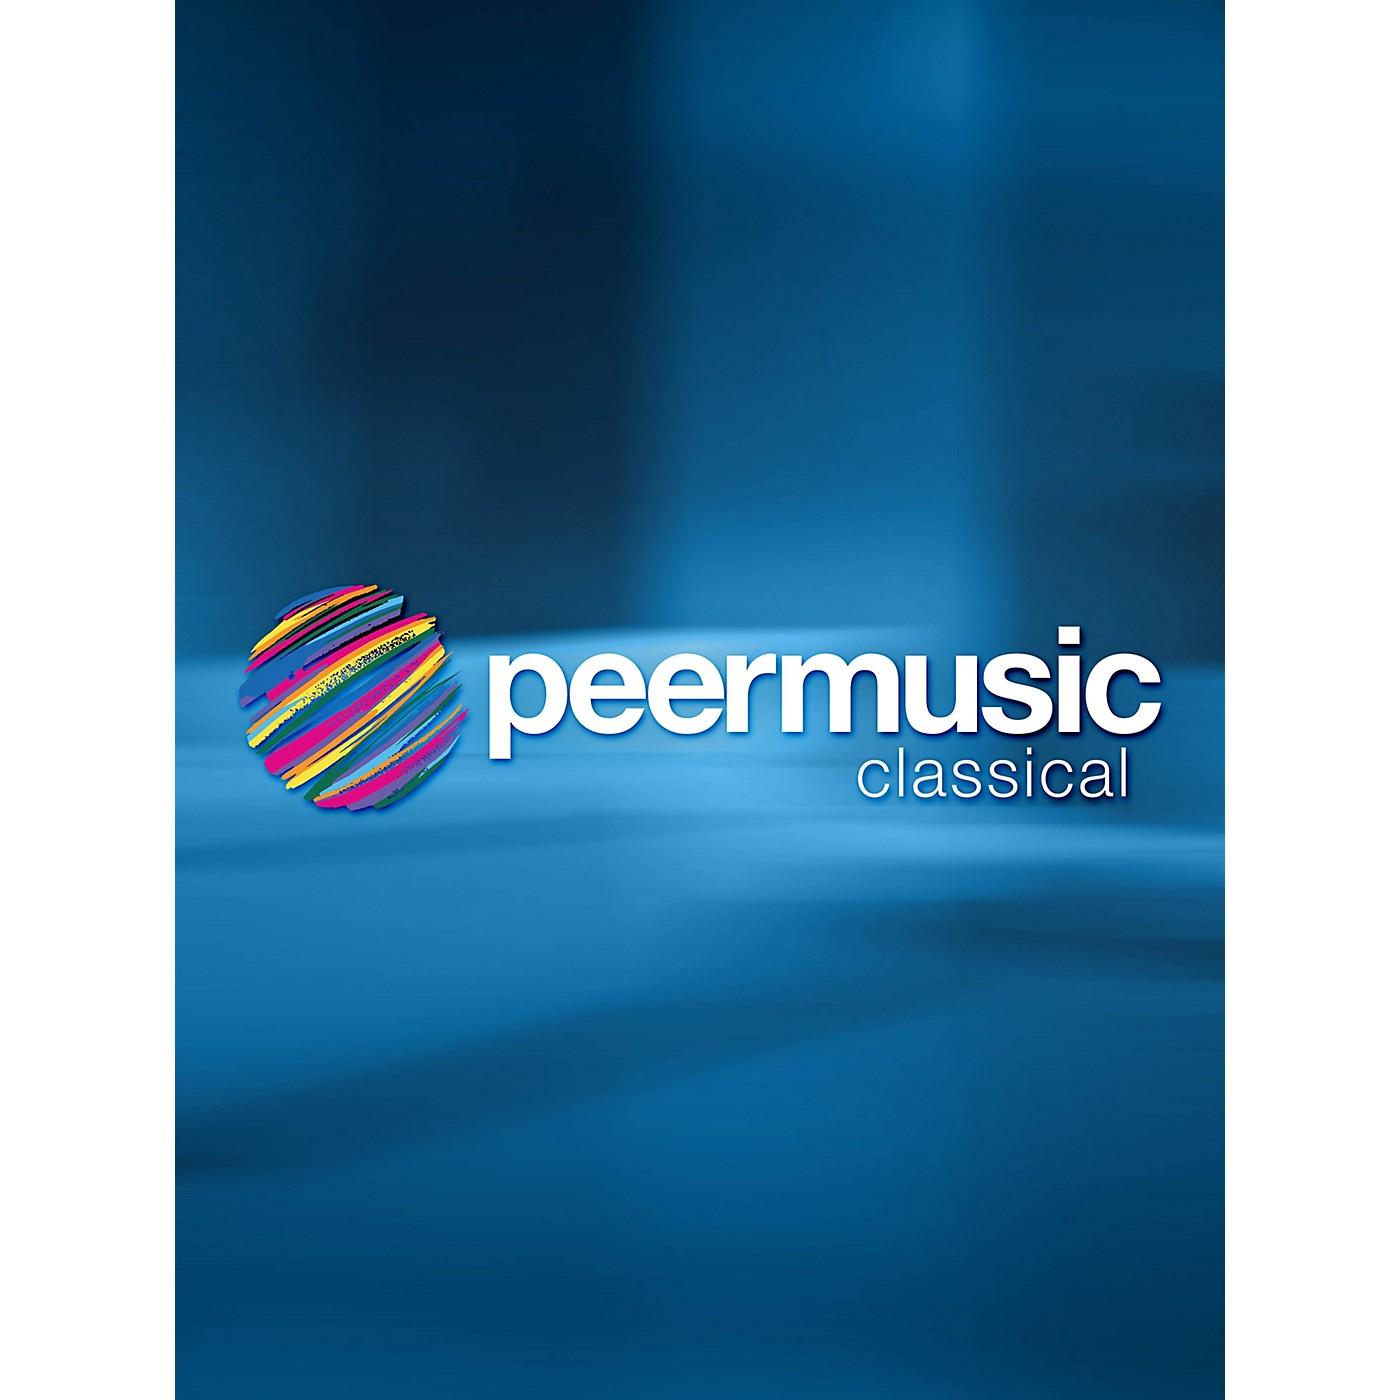 Peer Music 5 Minatures (Brass Quintet) Peermusic Classical Series Book  by Robert Starer thumbnail